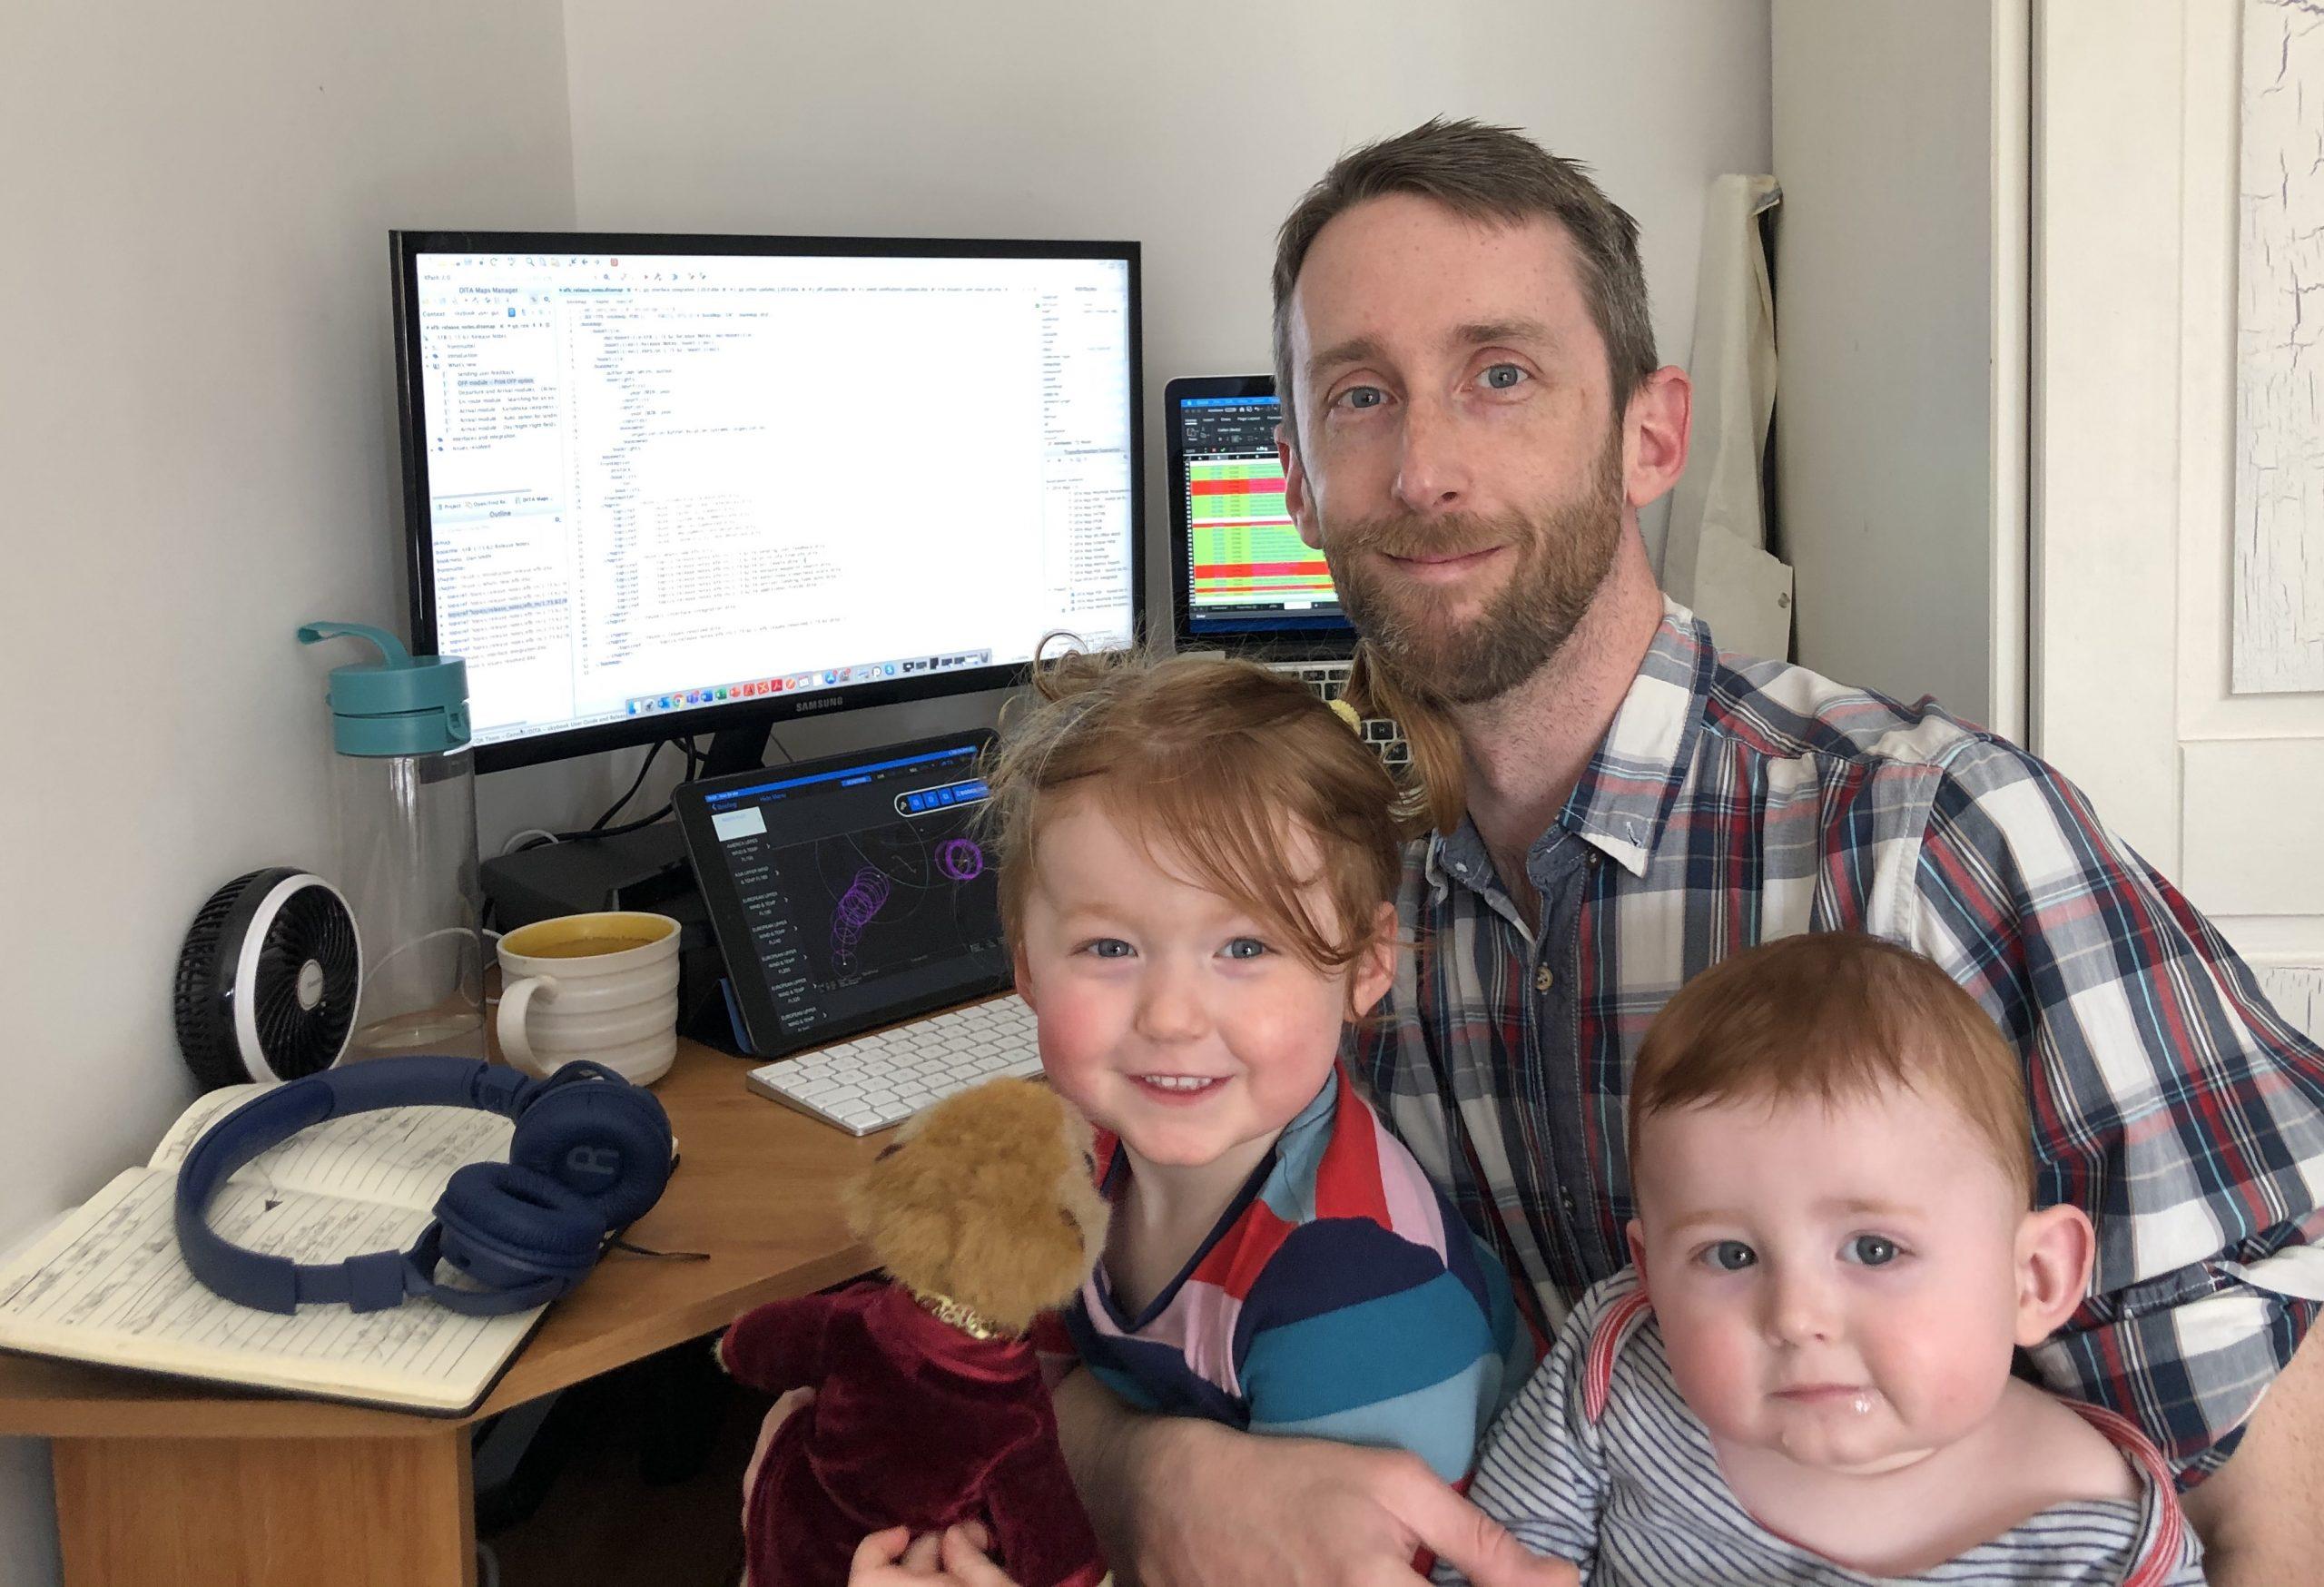 Meet Dan our technical author